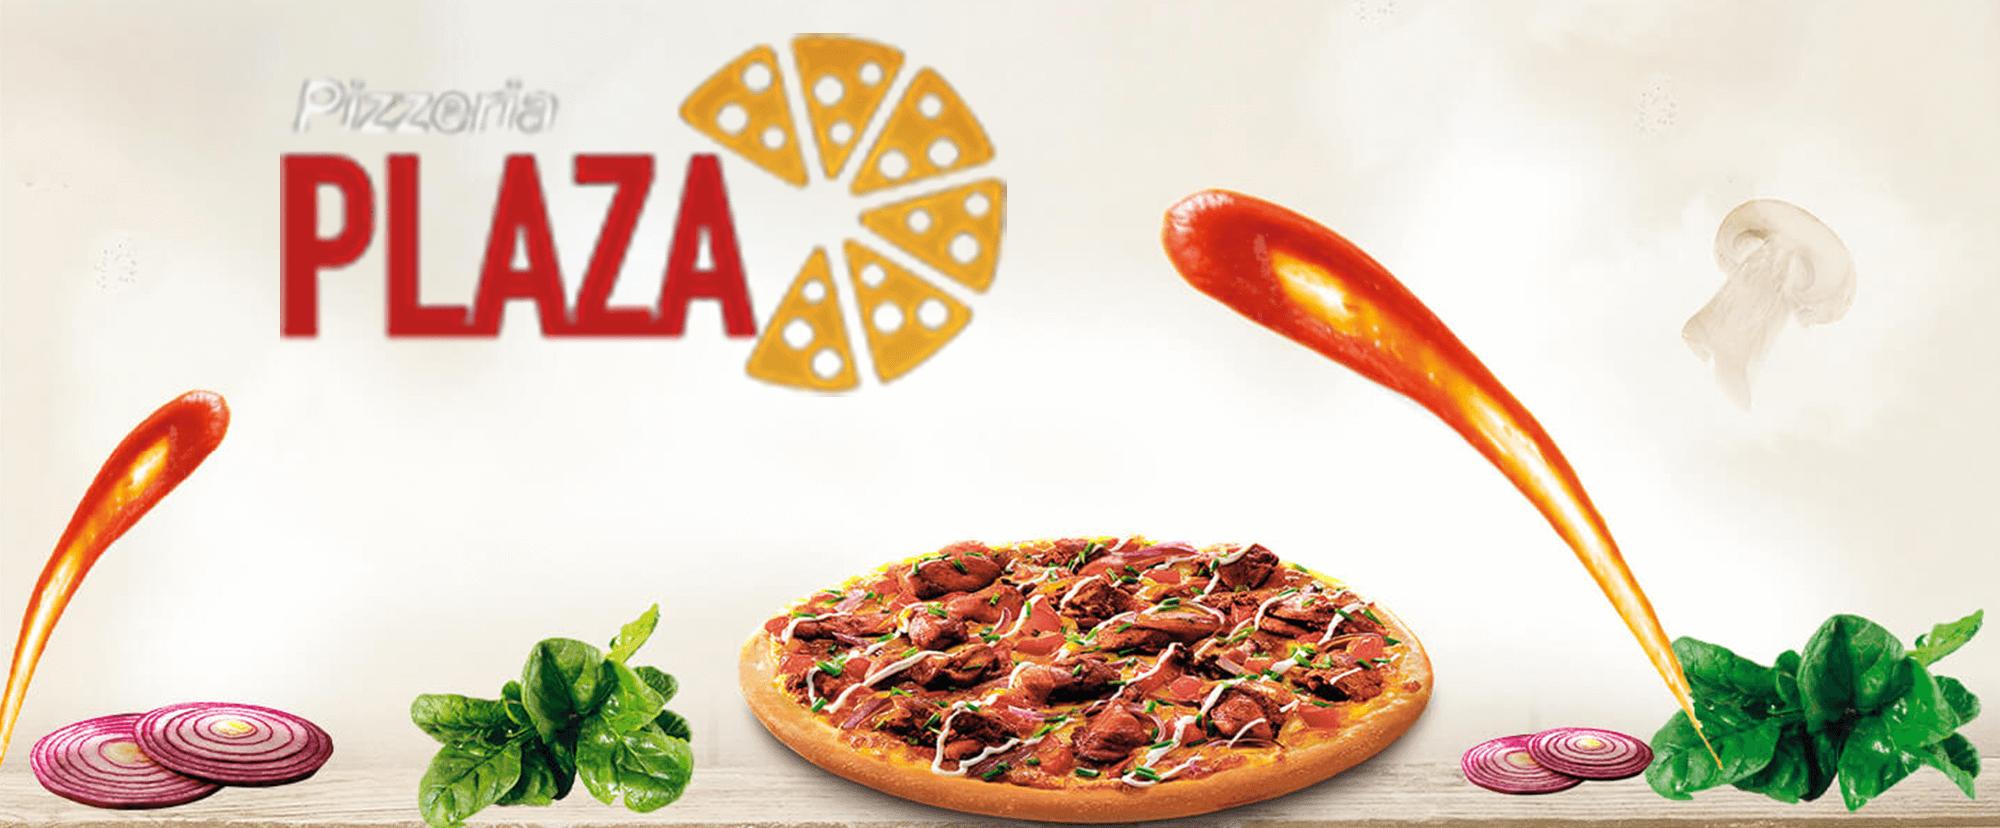 pizza-plaza_image